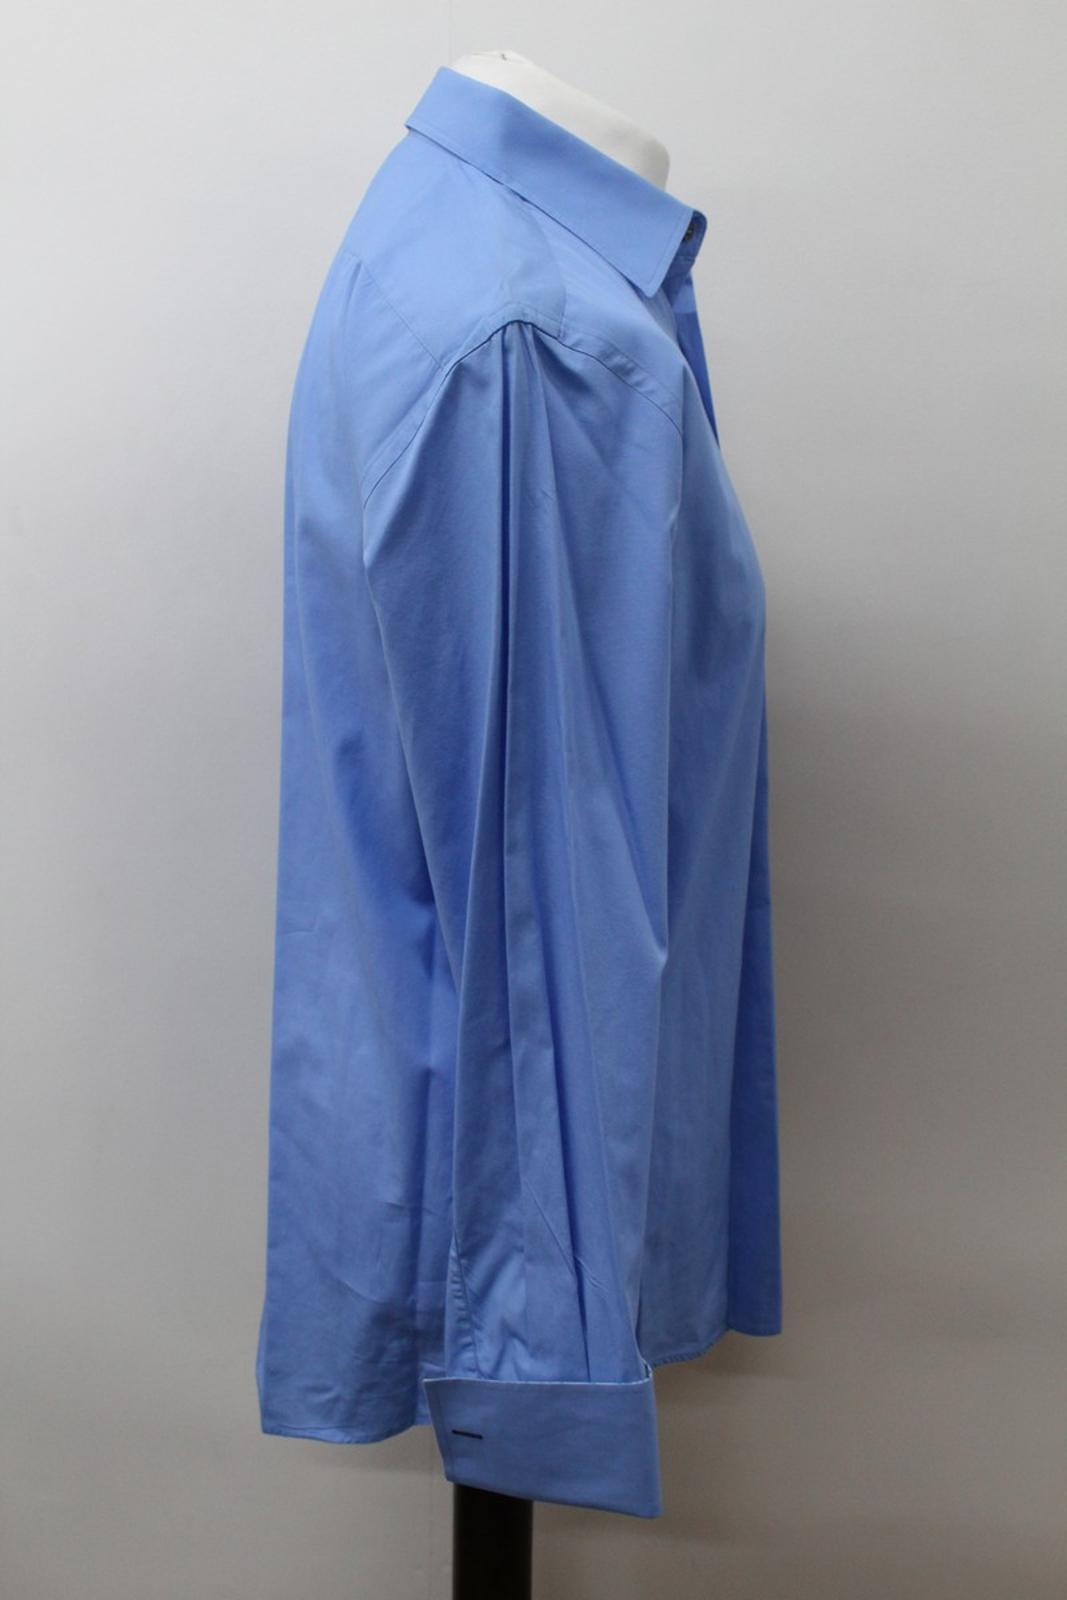 Paul-Smith-Hombres-Azul-Algodon-Mangas-Largas-Camisa-De-Puno-Doble-Cuello-16-5-034-42cm miniatura 4